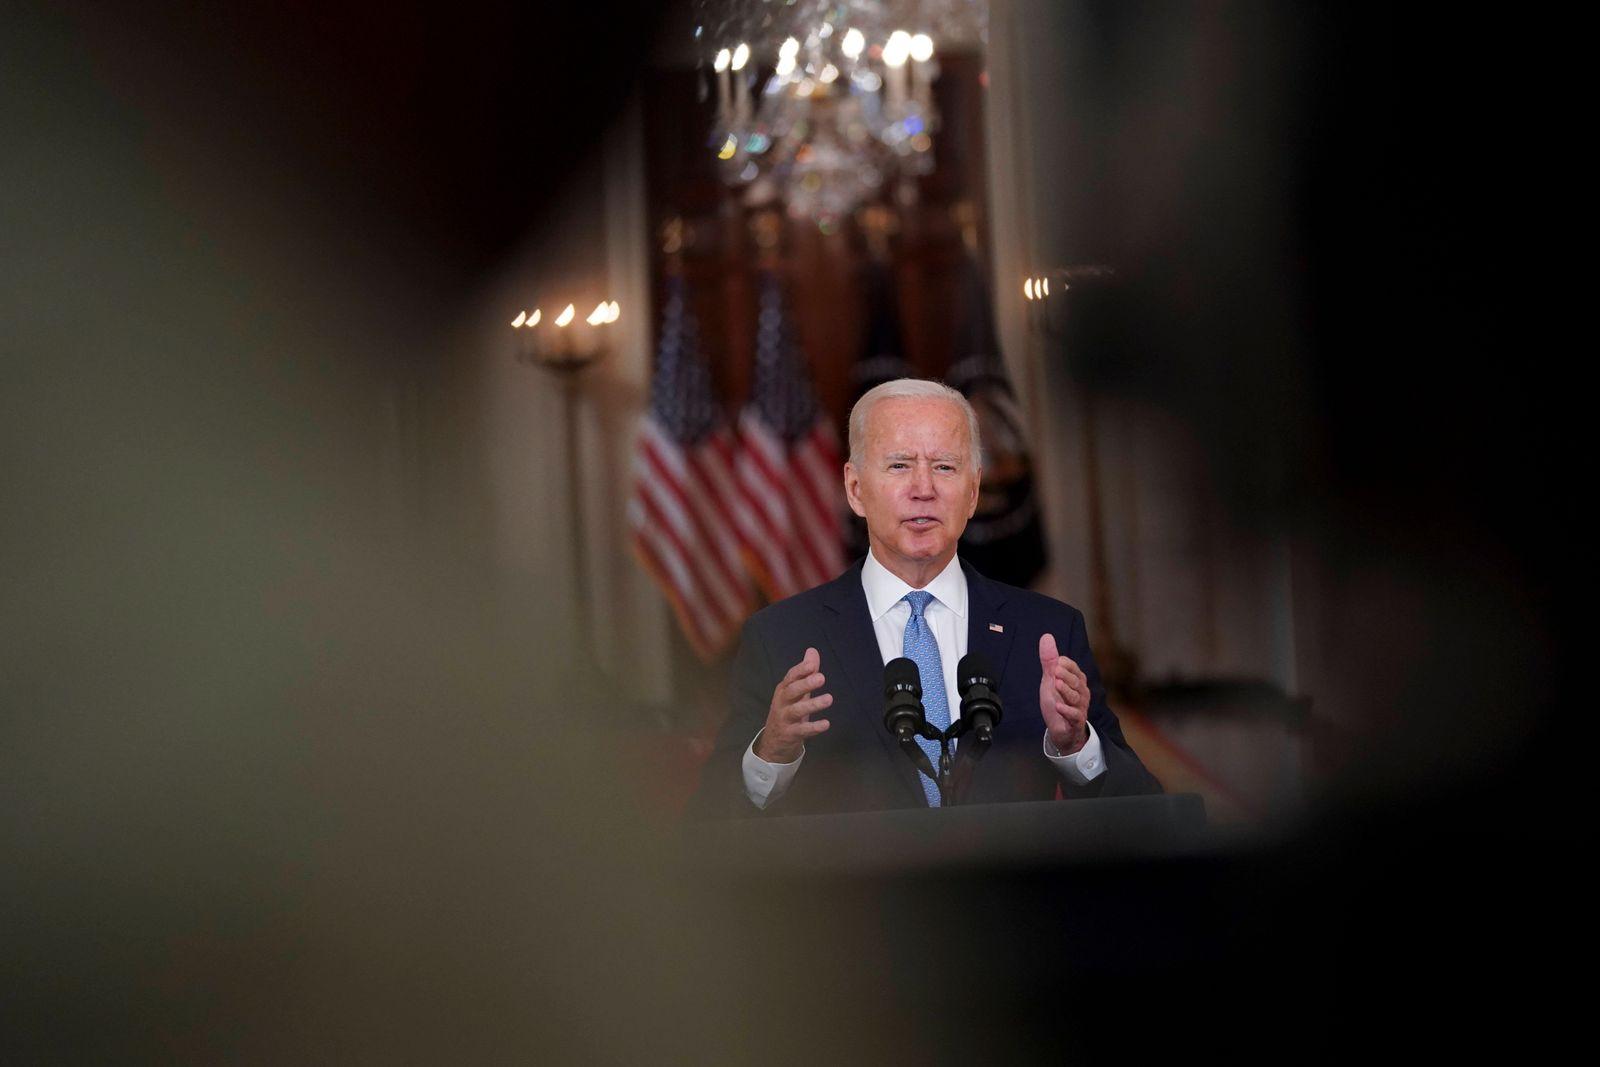 August 31, 2021, Washington, District of Columbia, USA: U.S. President Joe Biden speaks at the White House in Washington